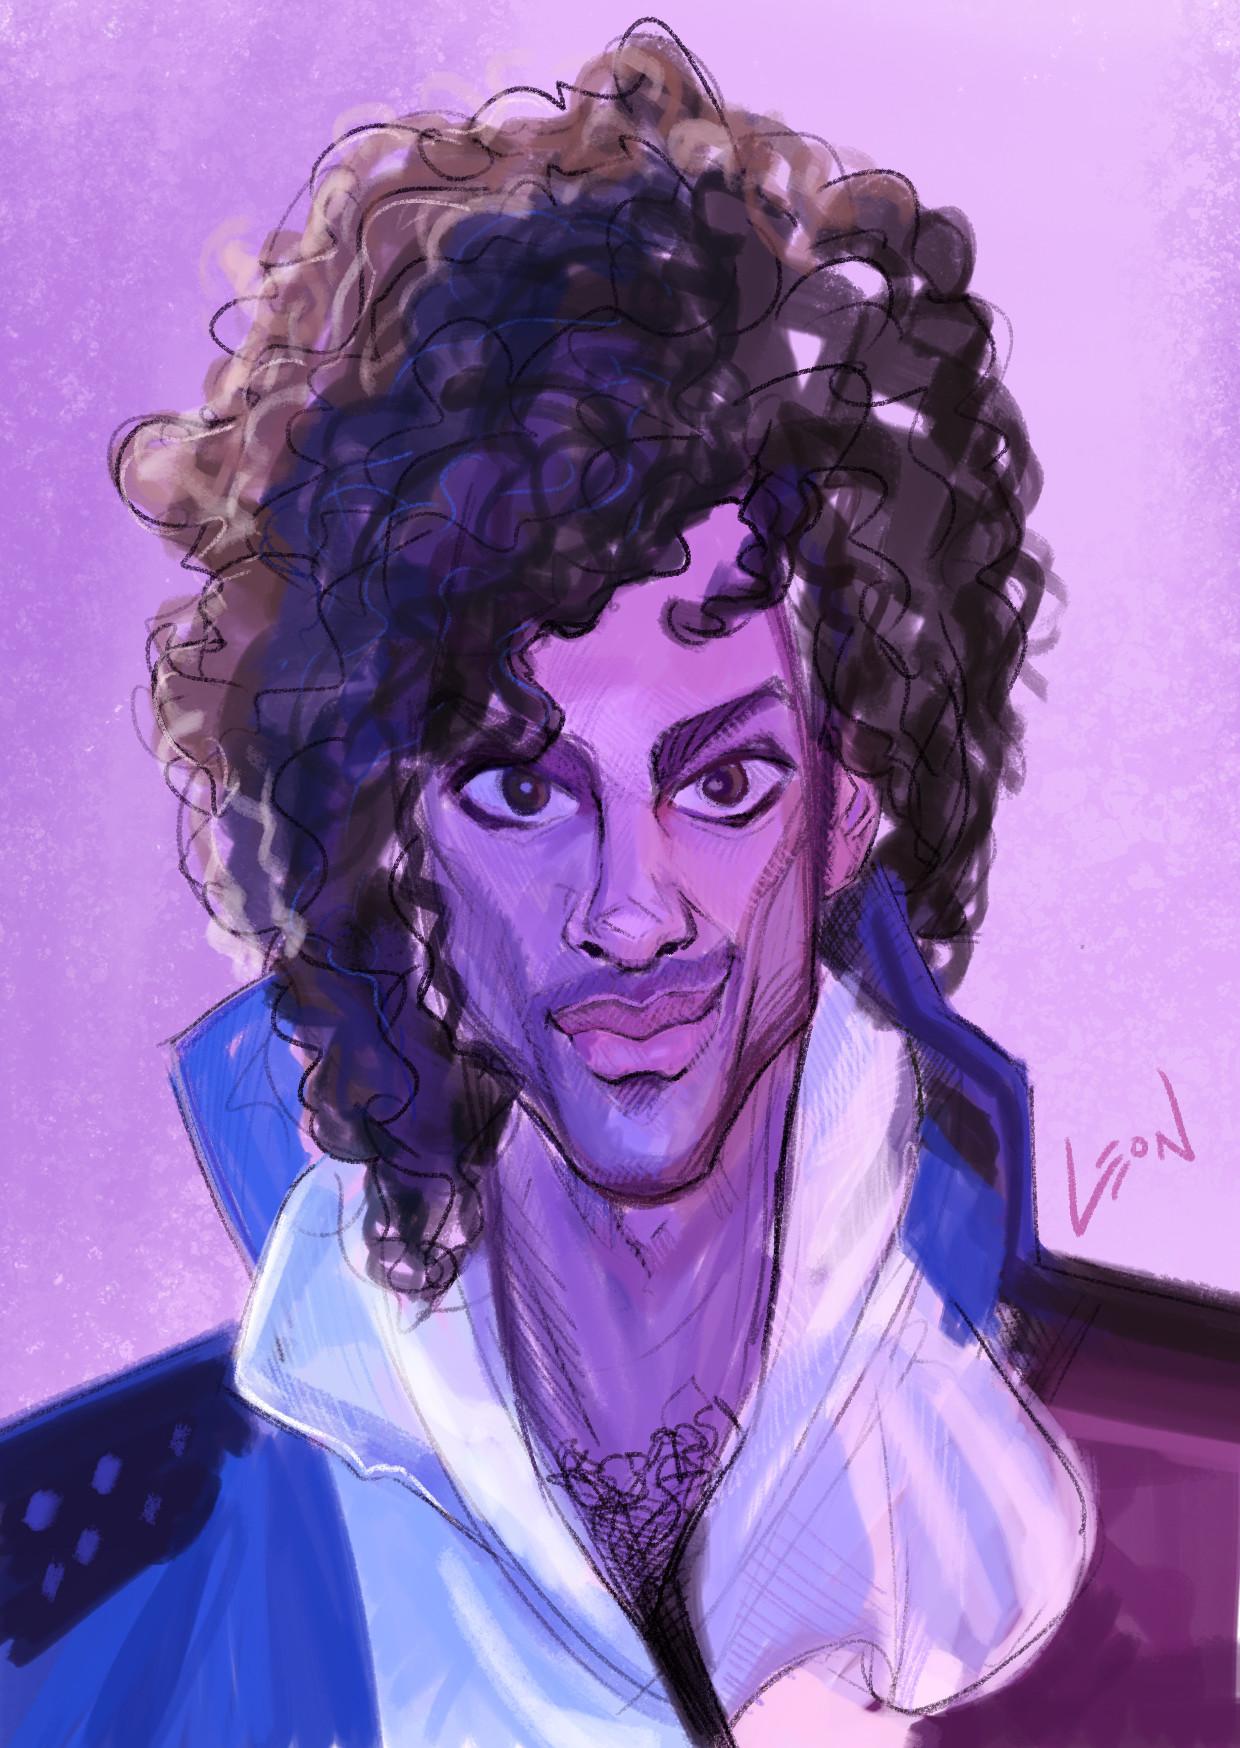 Leon bolwerk prince